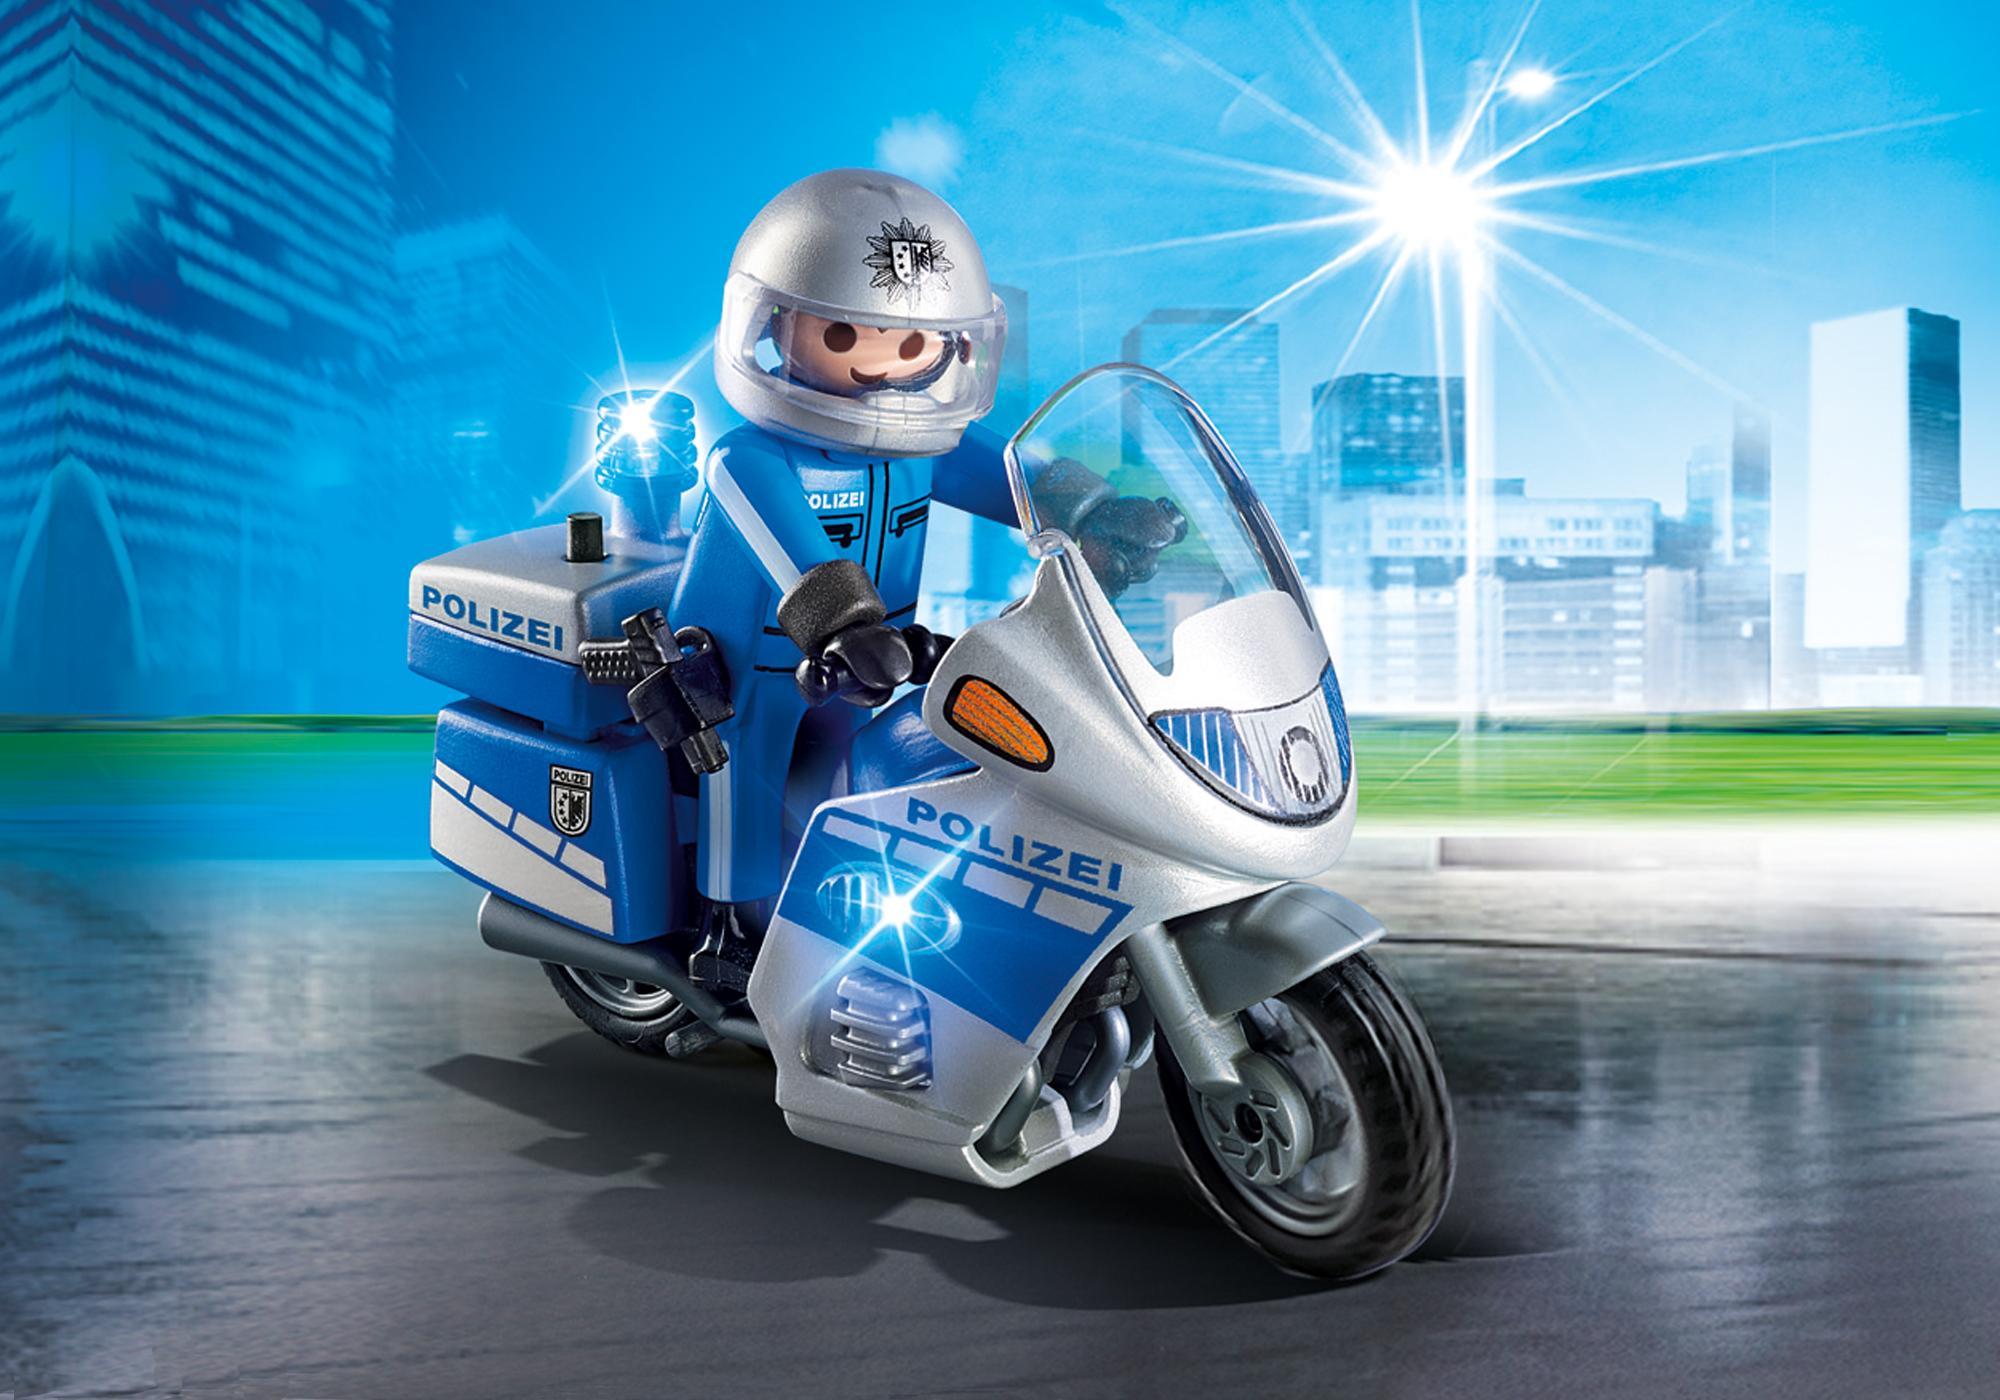 http://media.playmobil.com/i/playmobil/6876_product_detail/Motorradstreife mit LED-Blinklicht